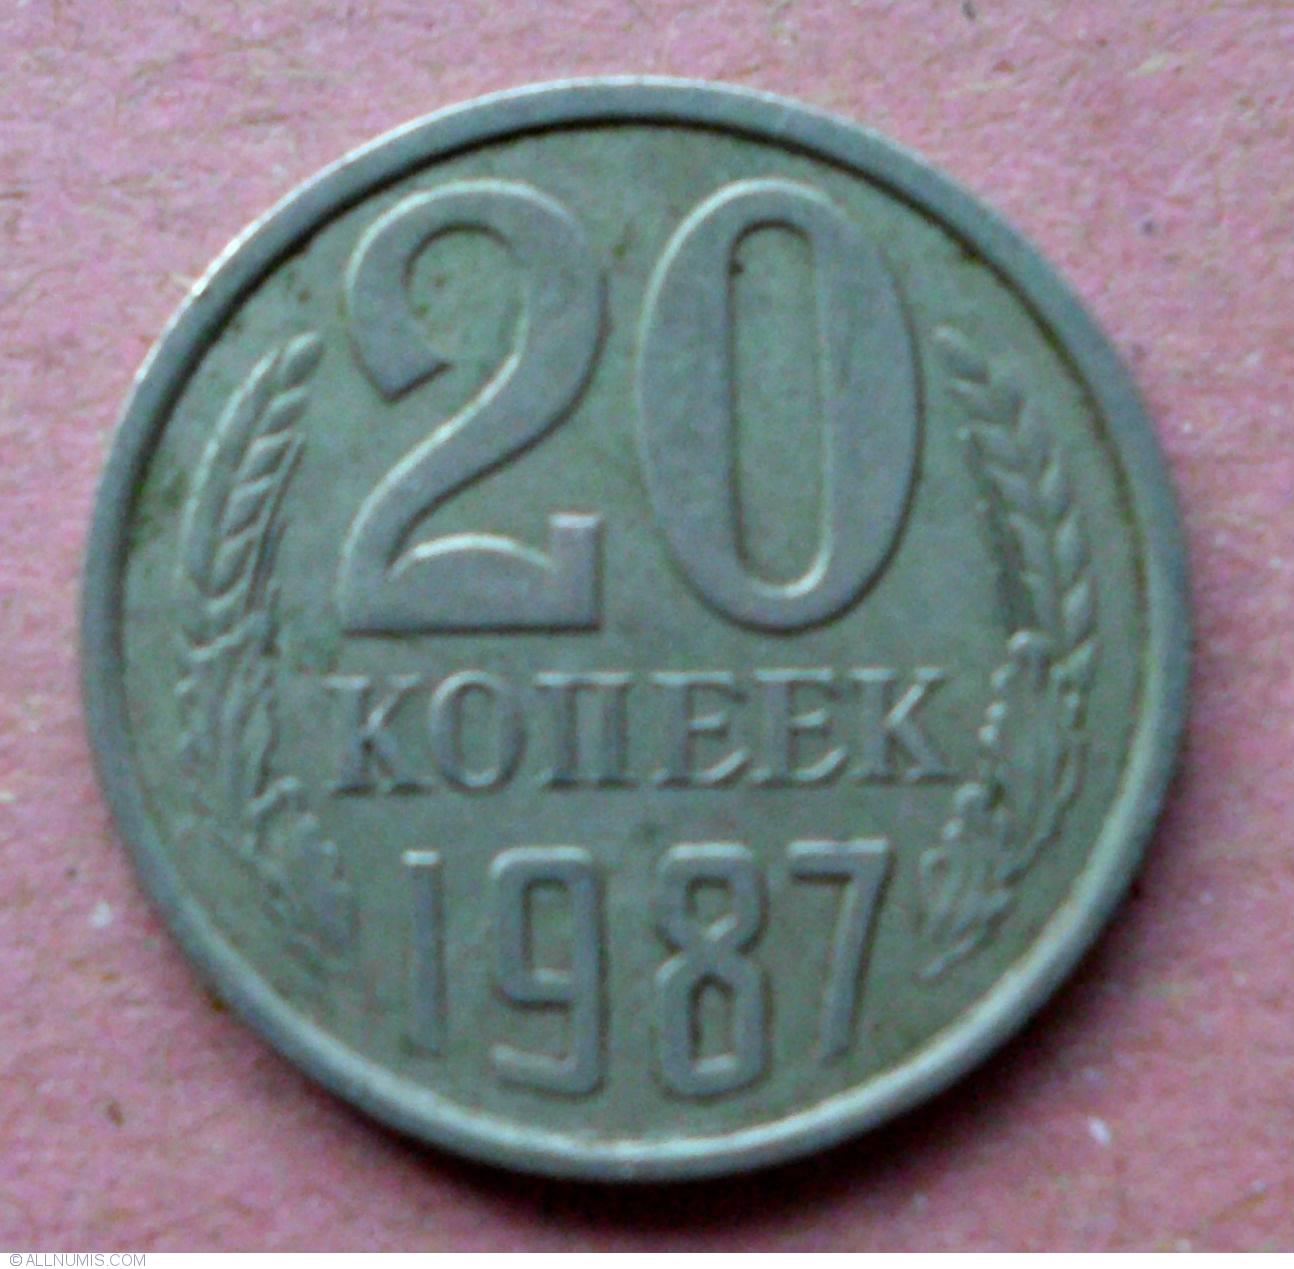 Russia USSR last set of 7 coins 1 2 3 5 10 15 20 kopeek 1987-1991 UNC